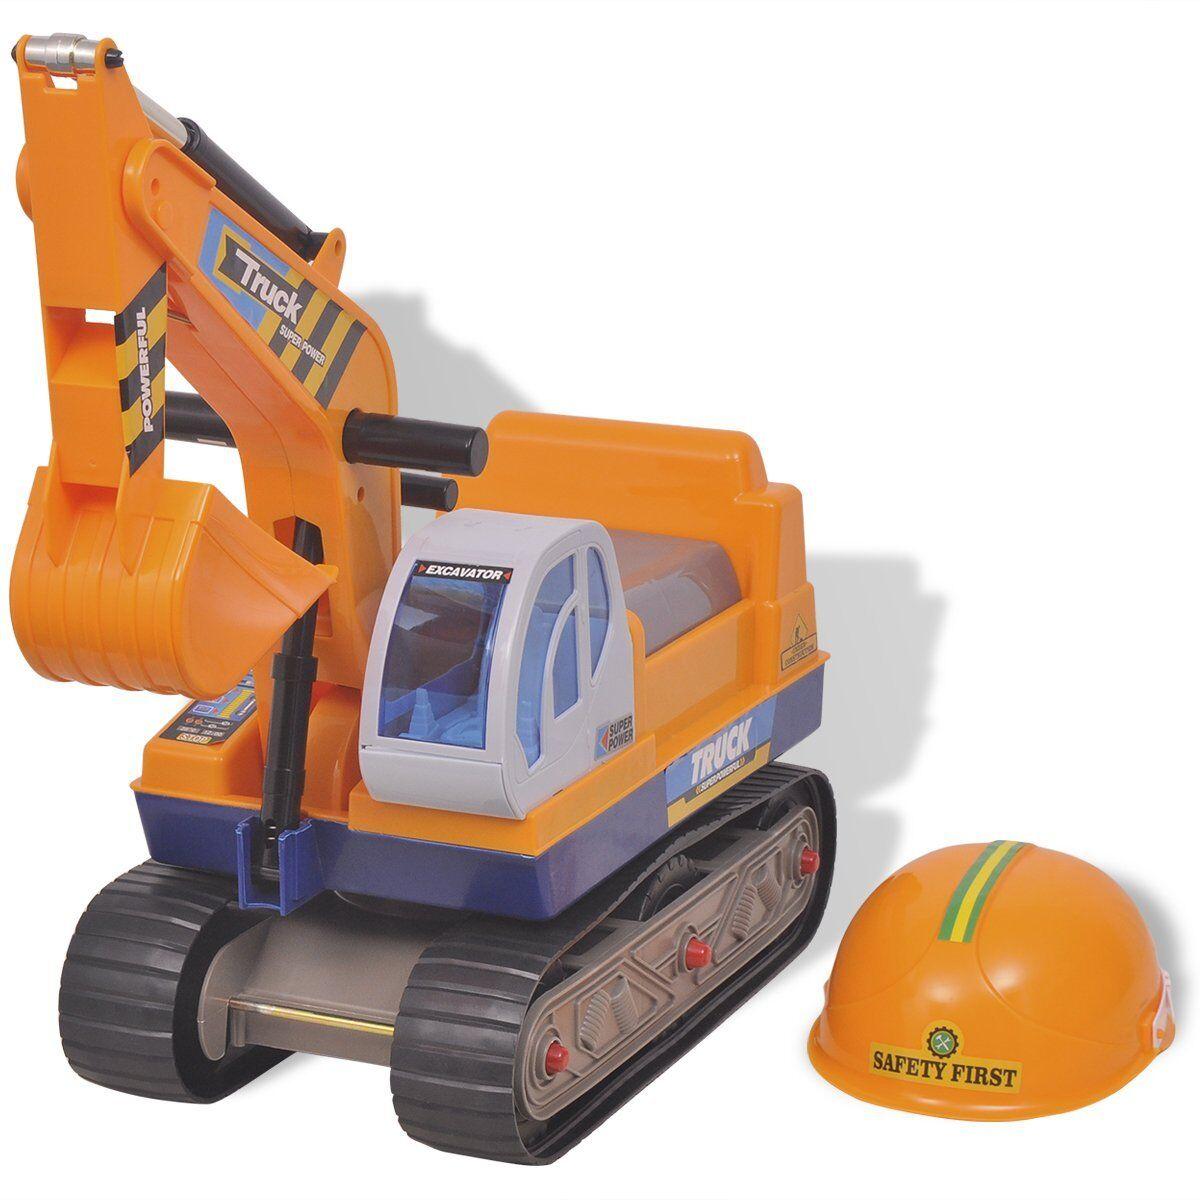 VidaXL Kinderbagger Bagger Sitzbagger Sandbagger Spielzeug Rutschauto Helm    Preiszugeständnisse